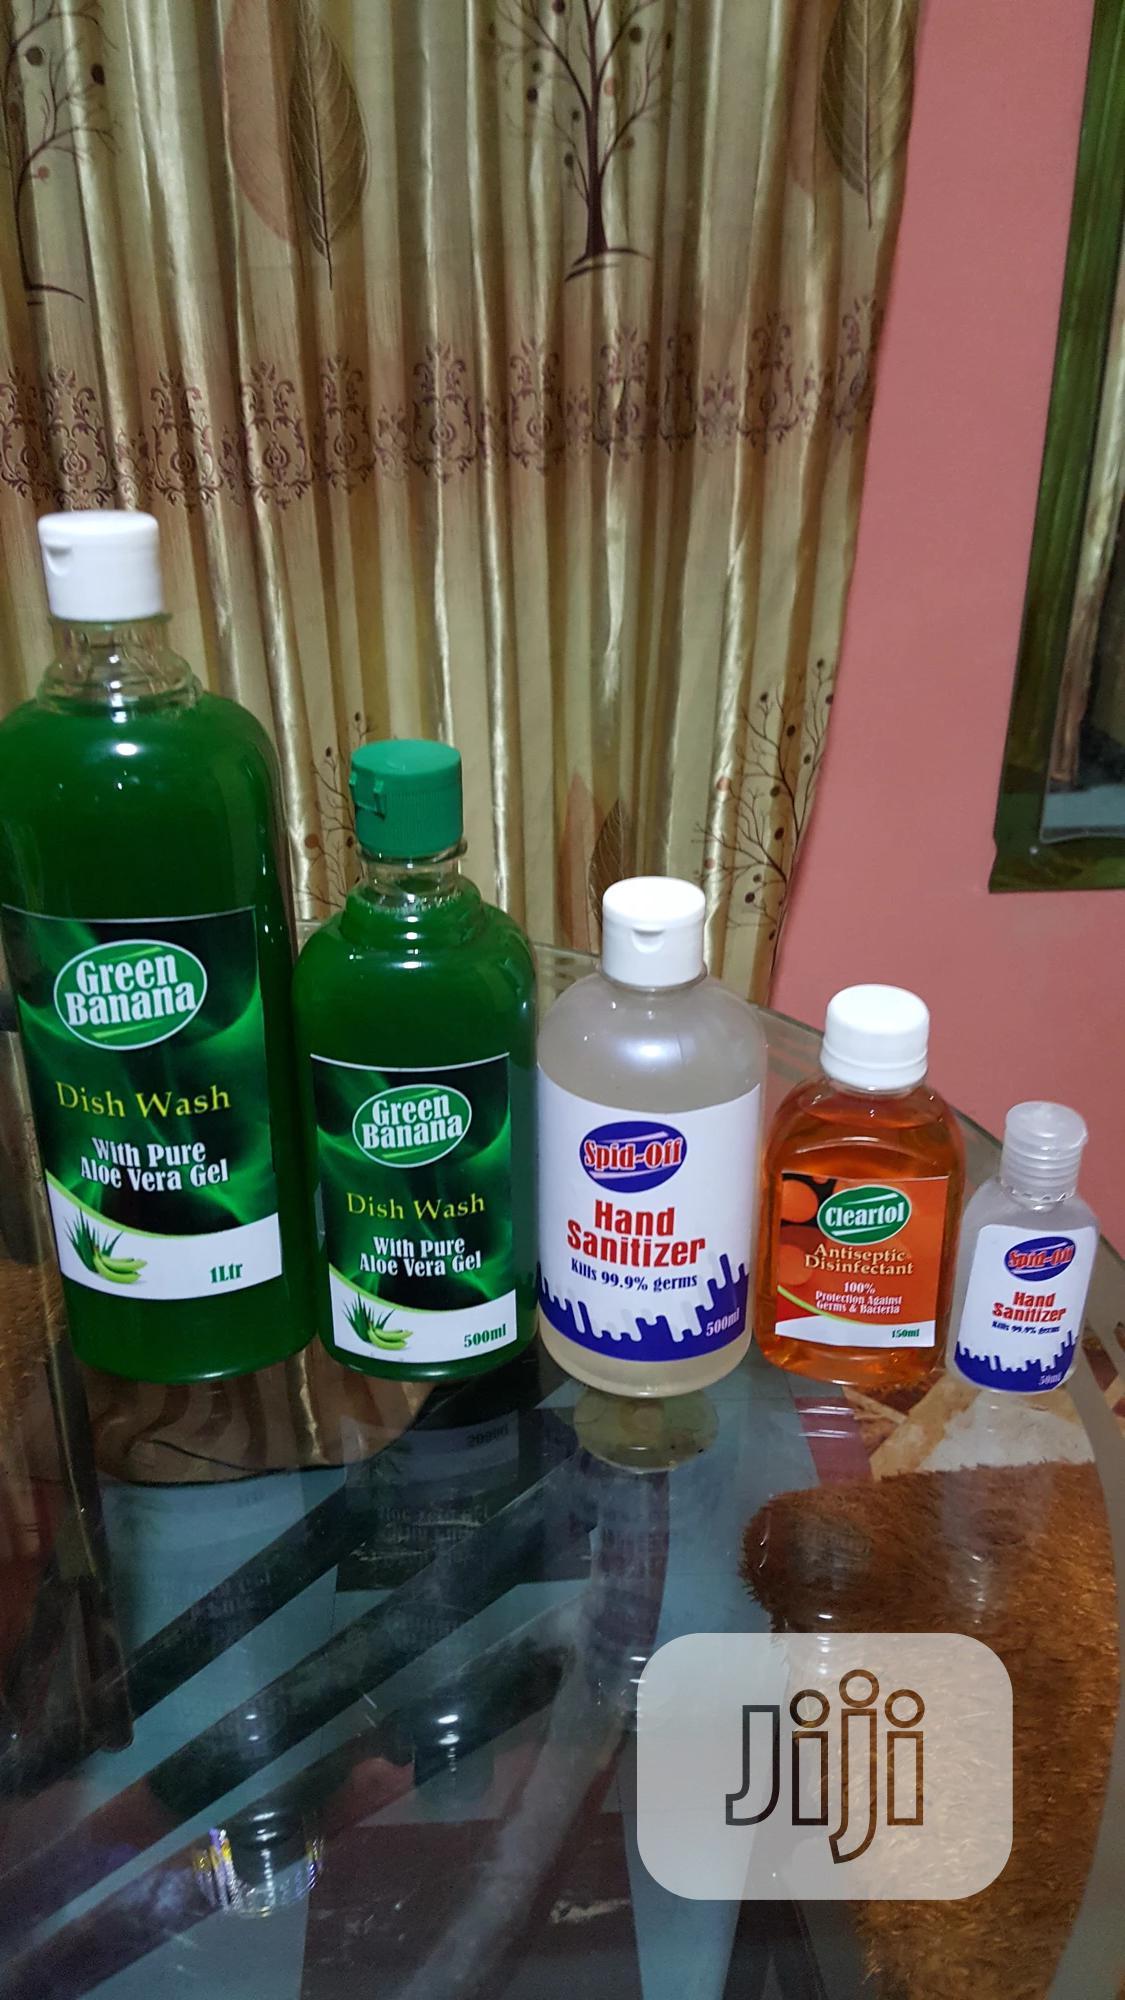 Archive: Green Banana Dish Washing Liqiud and Hand Sanitizer